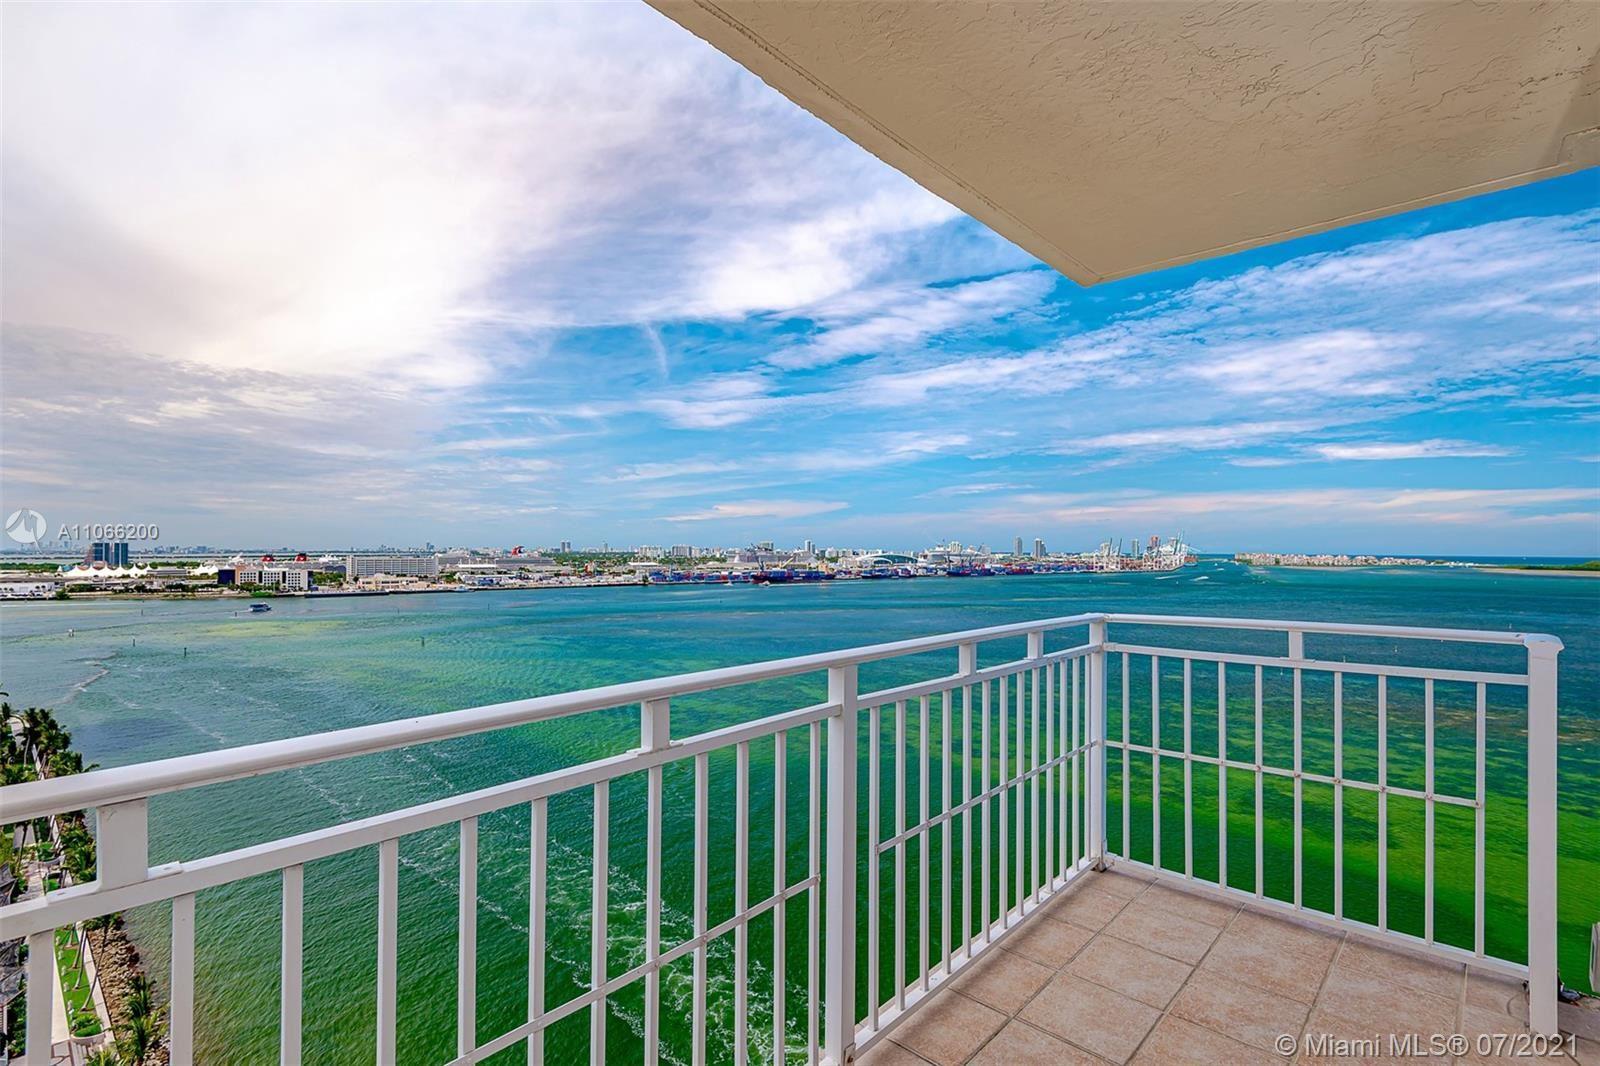 770 Claughton Island Dr #PH-15, Miami, FL 33131 - #: A11066200